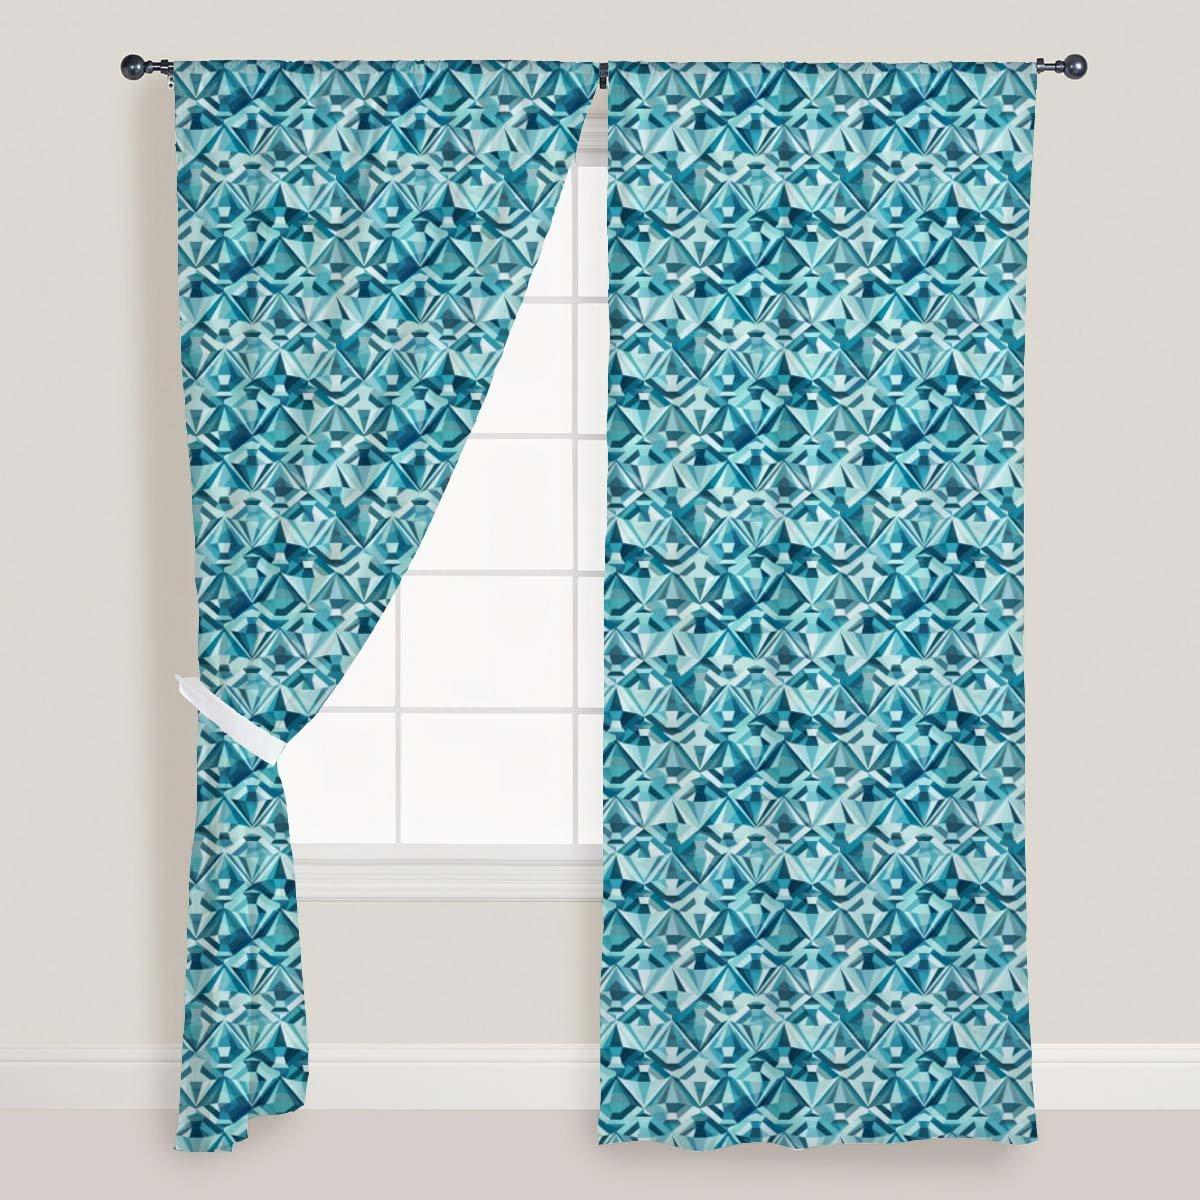 el mejor servicio post-venta ArtzFolio AZ AZ AZ Diamonds Door  Window Curtain Satin 4feet x 11feet; Set of 2 PCS  saludable